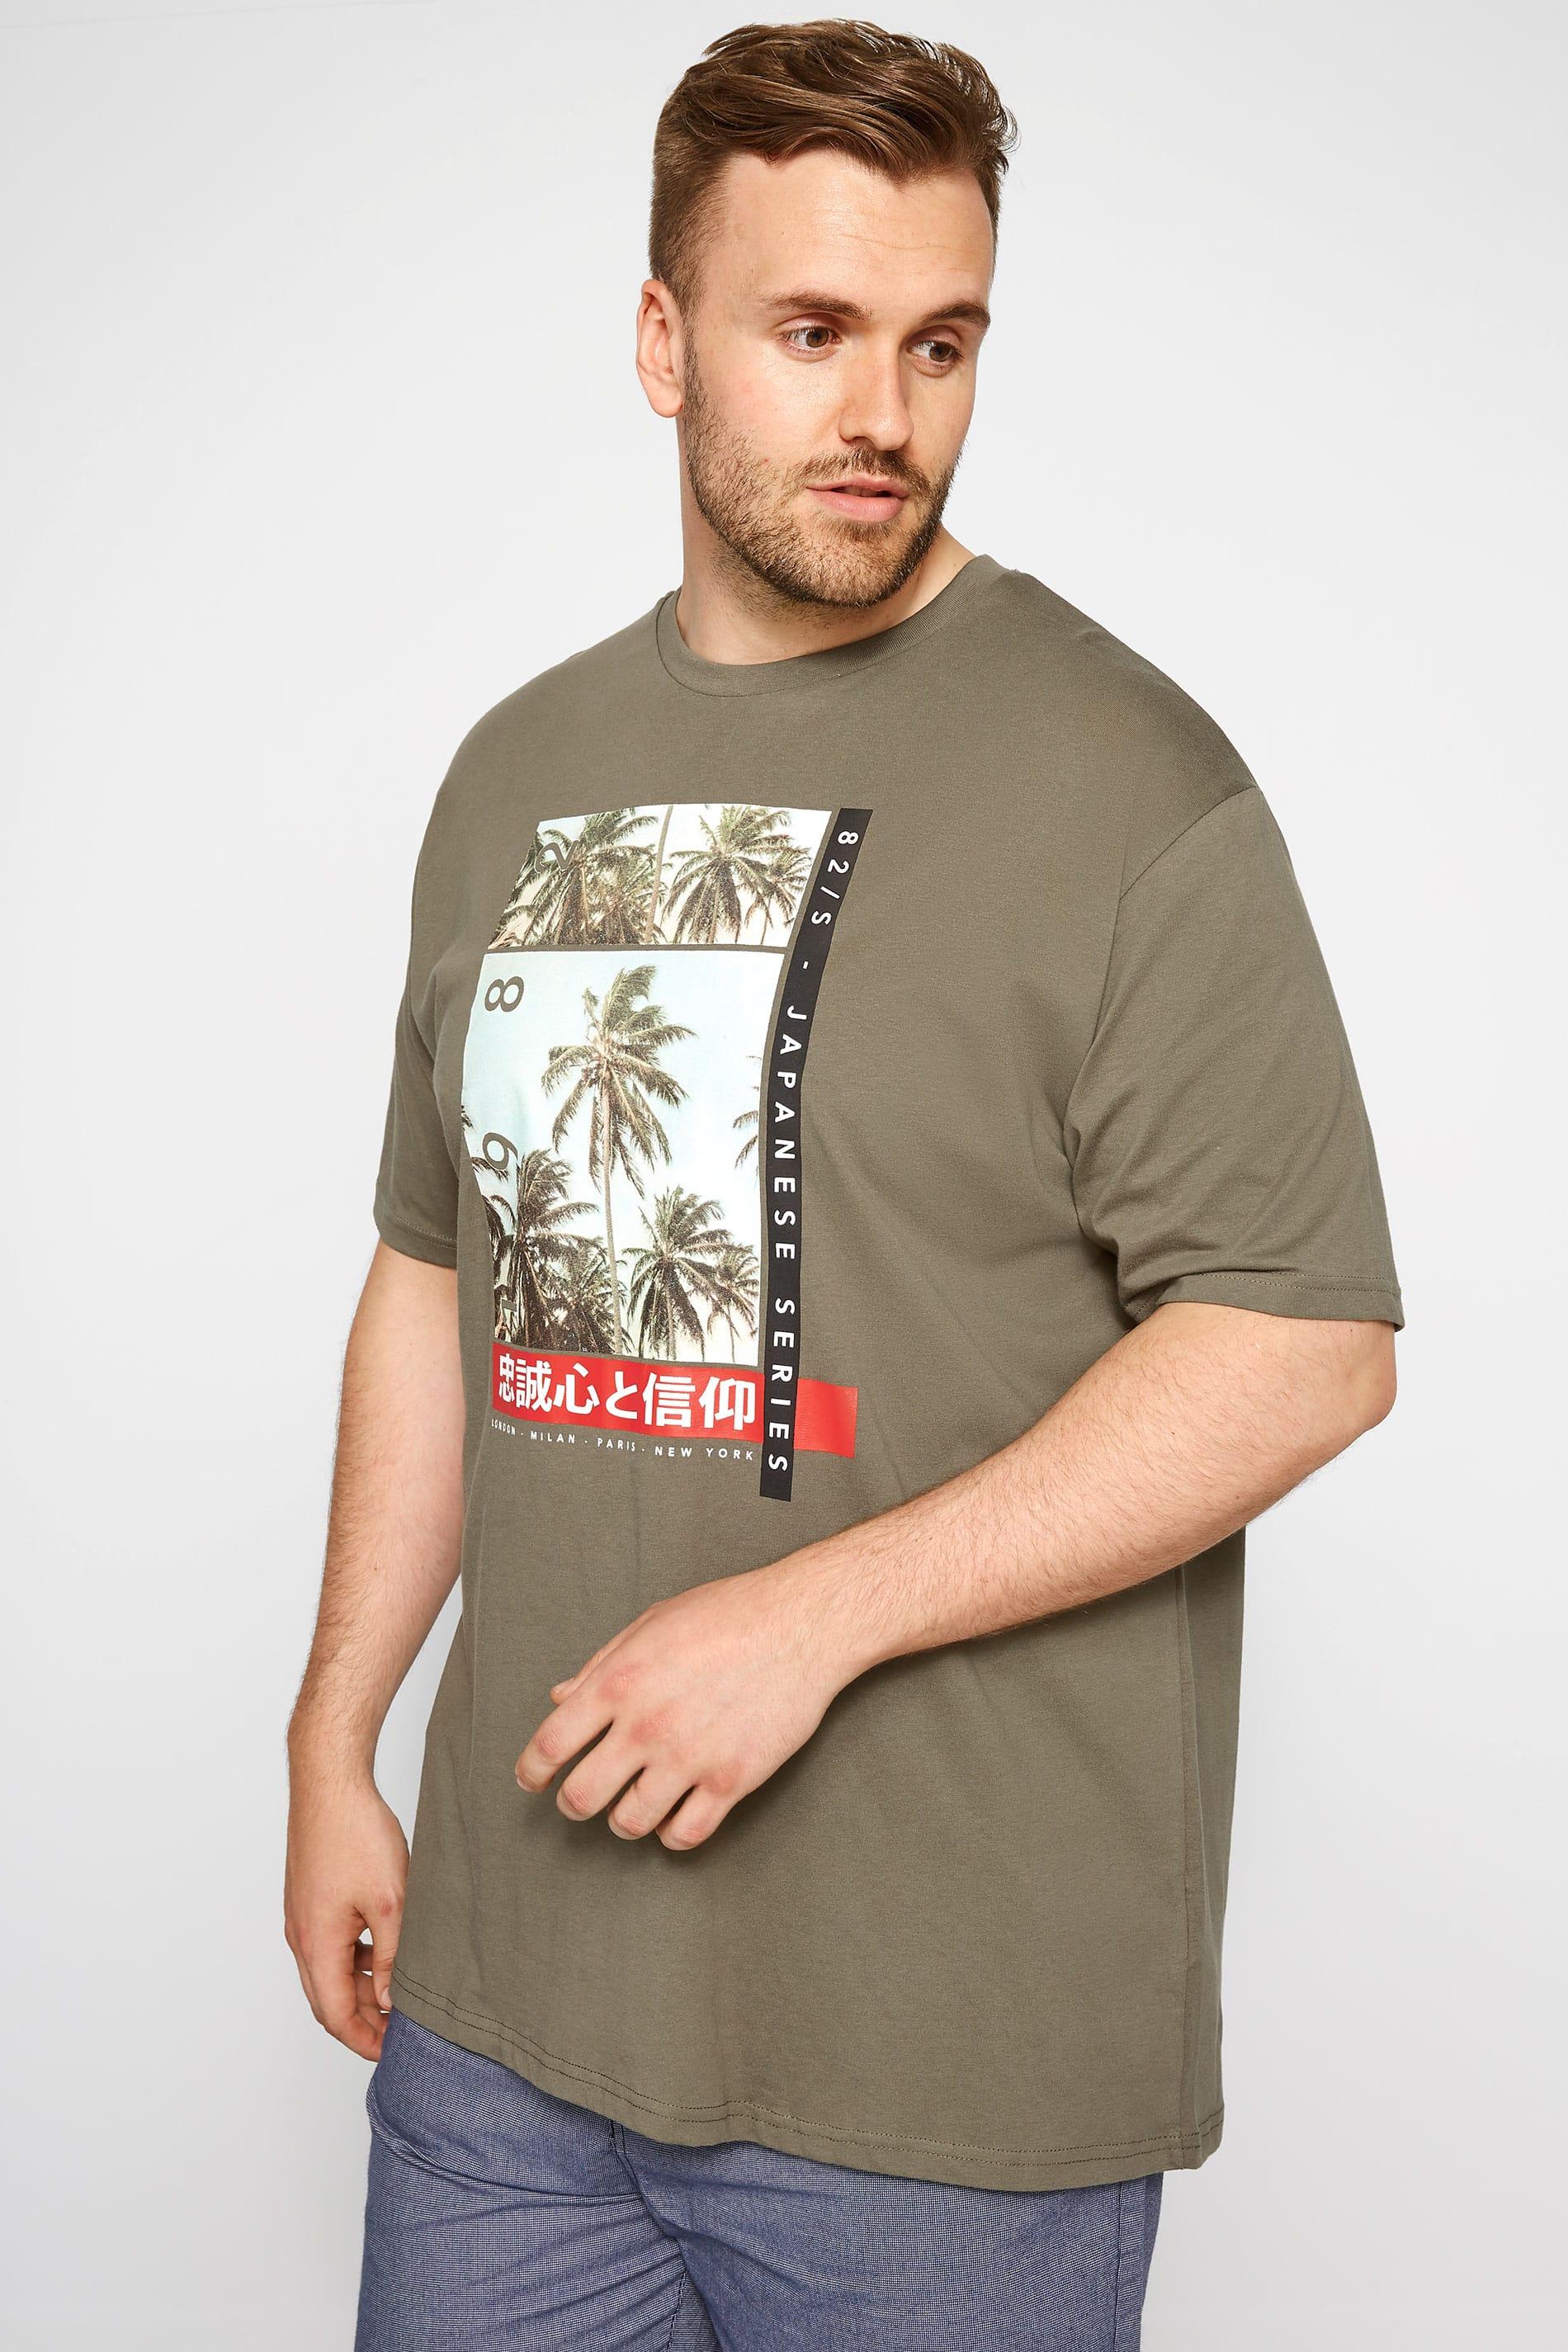 LOYALTY AND FAITH Khaki Palm Tree Graphic T-Shirt